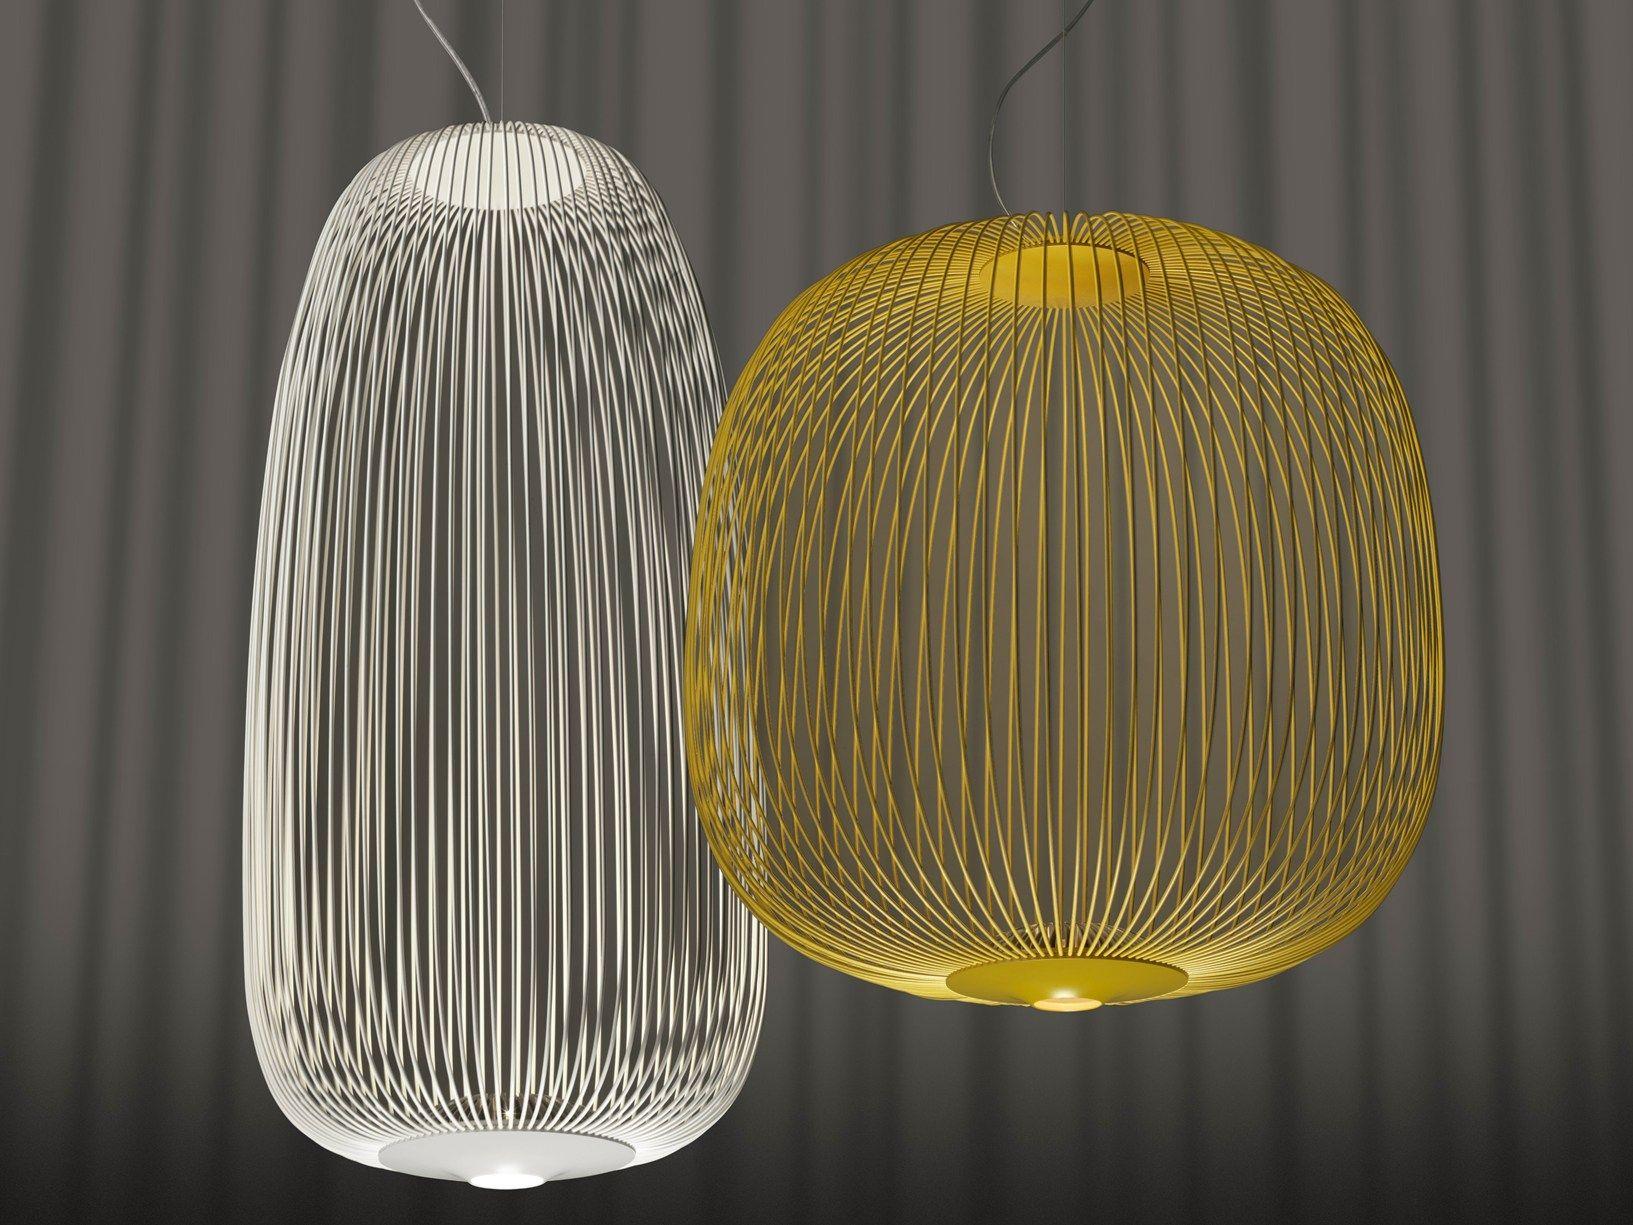 Foscarini Alla Milano Design Week Luce A Sospensione Lampada Led Lampade A Sospensione